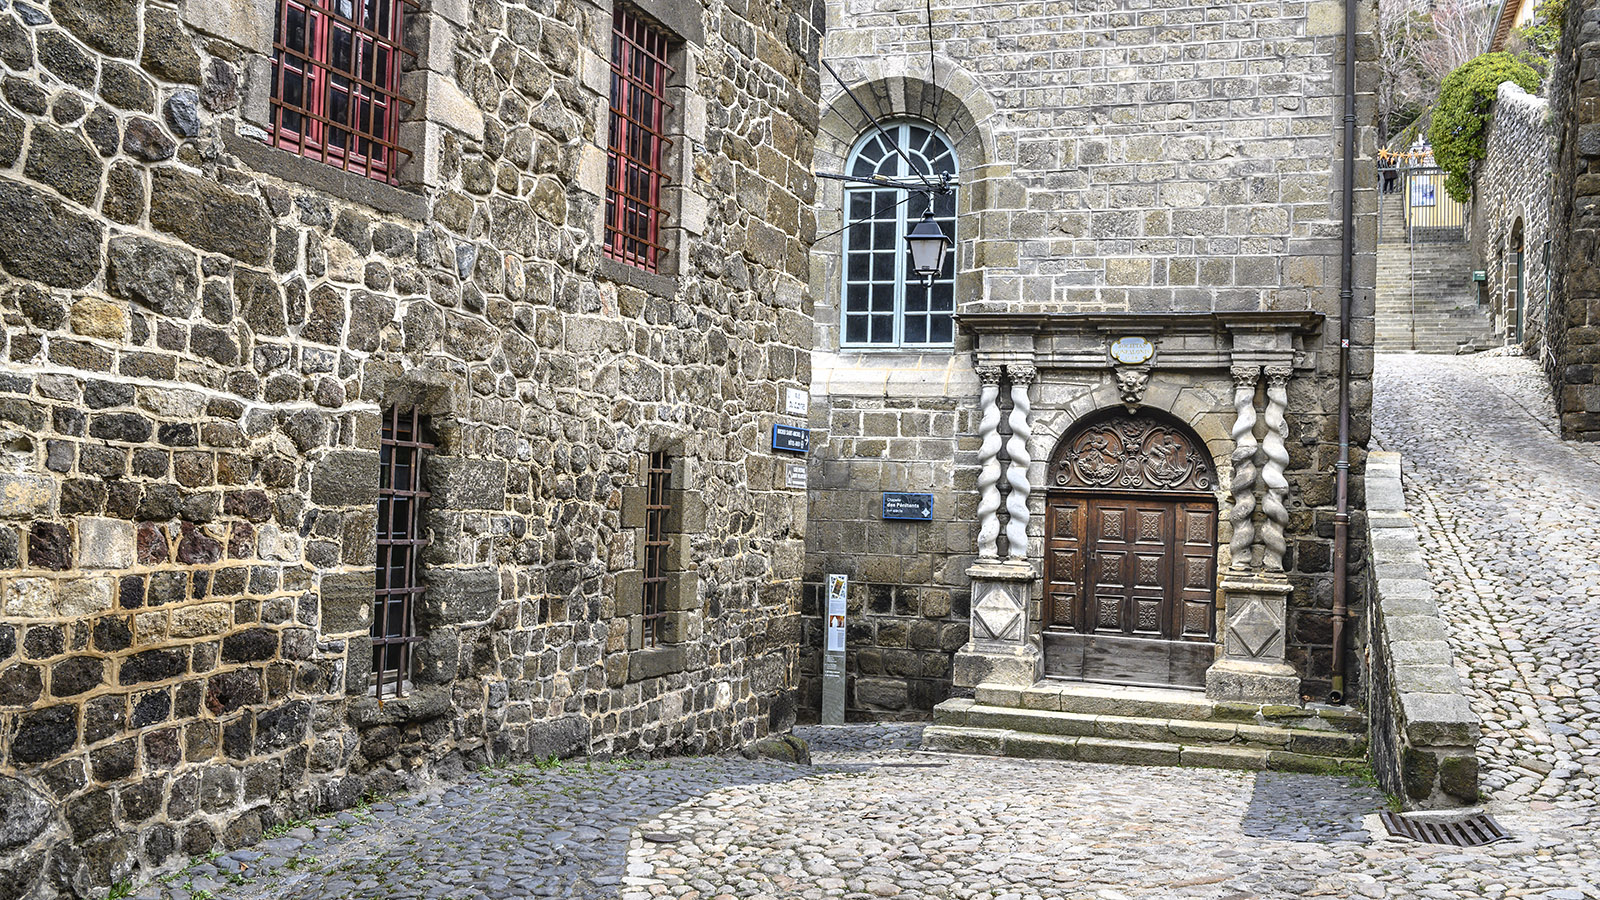 Die heilige Oberstadt von Le Puy-en-Velay. Foto: Hilke Maunder